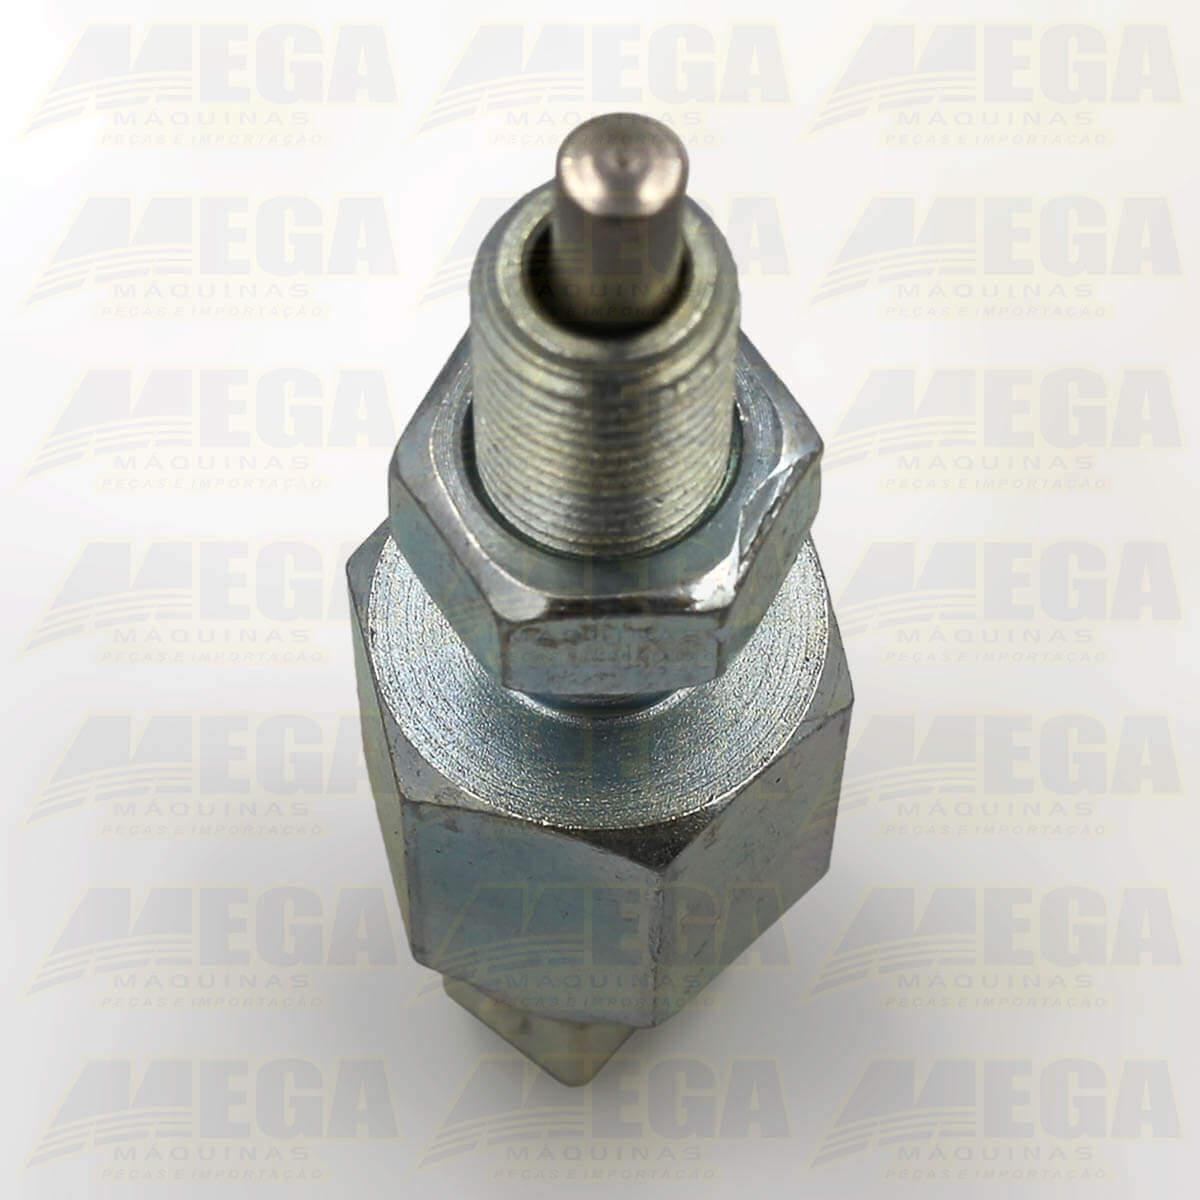 Sensor - 701/80266